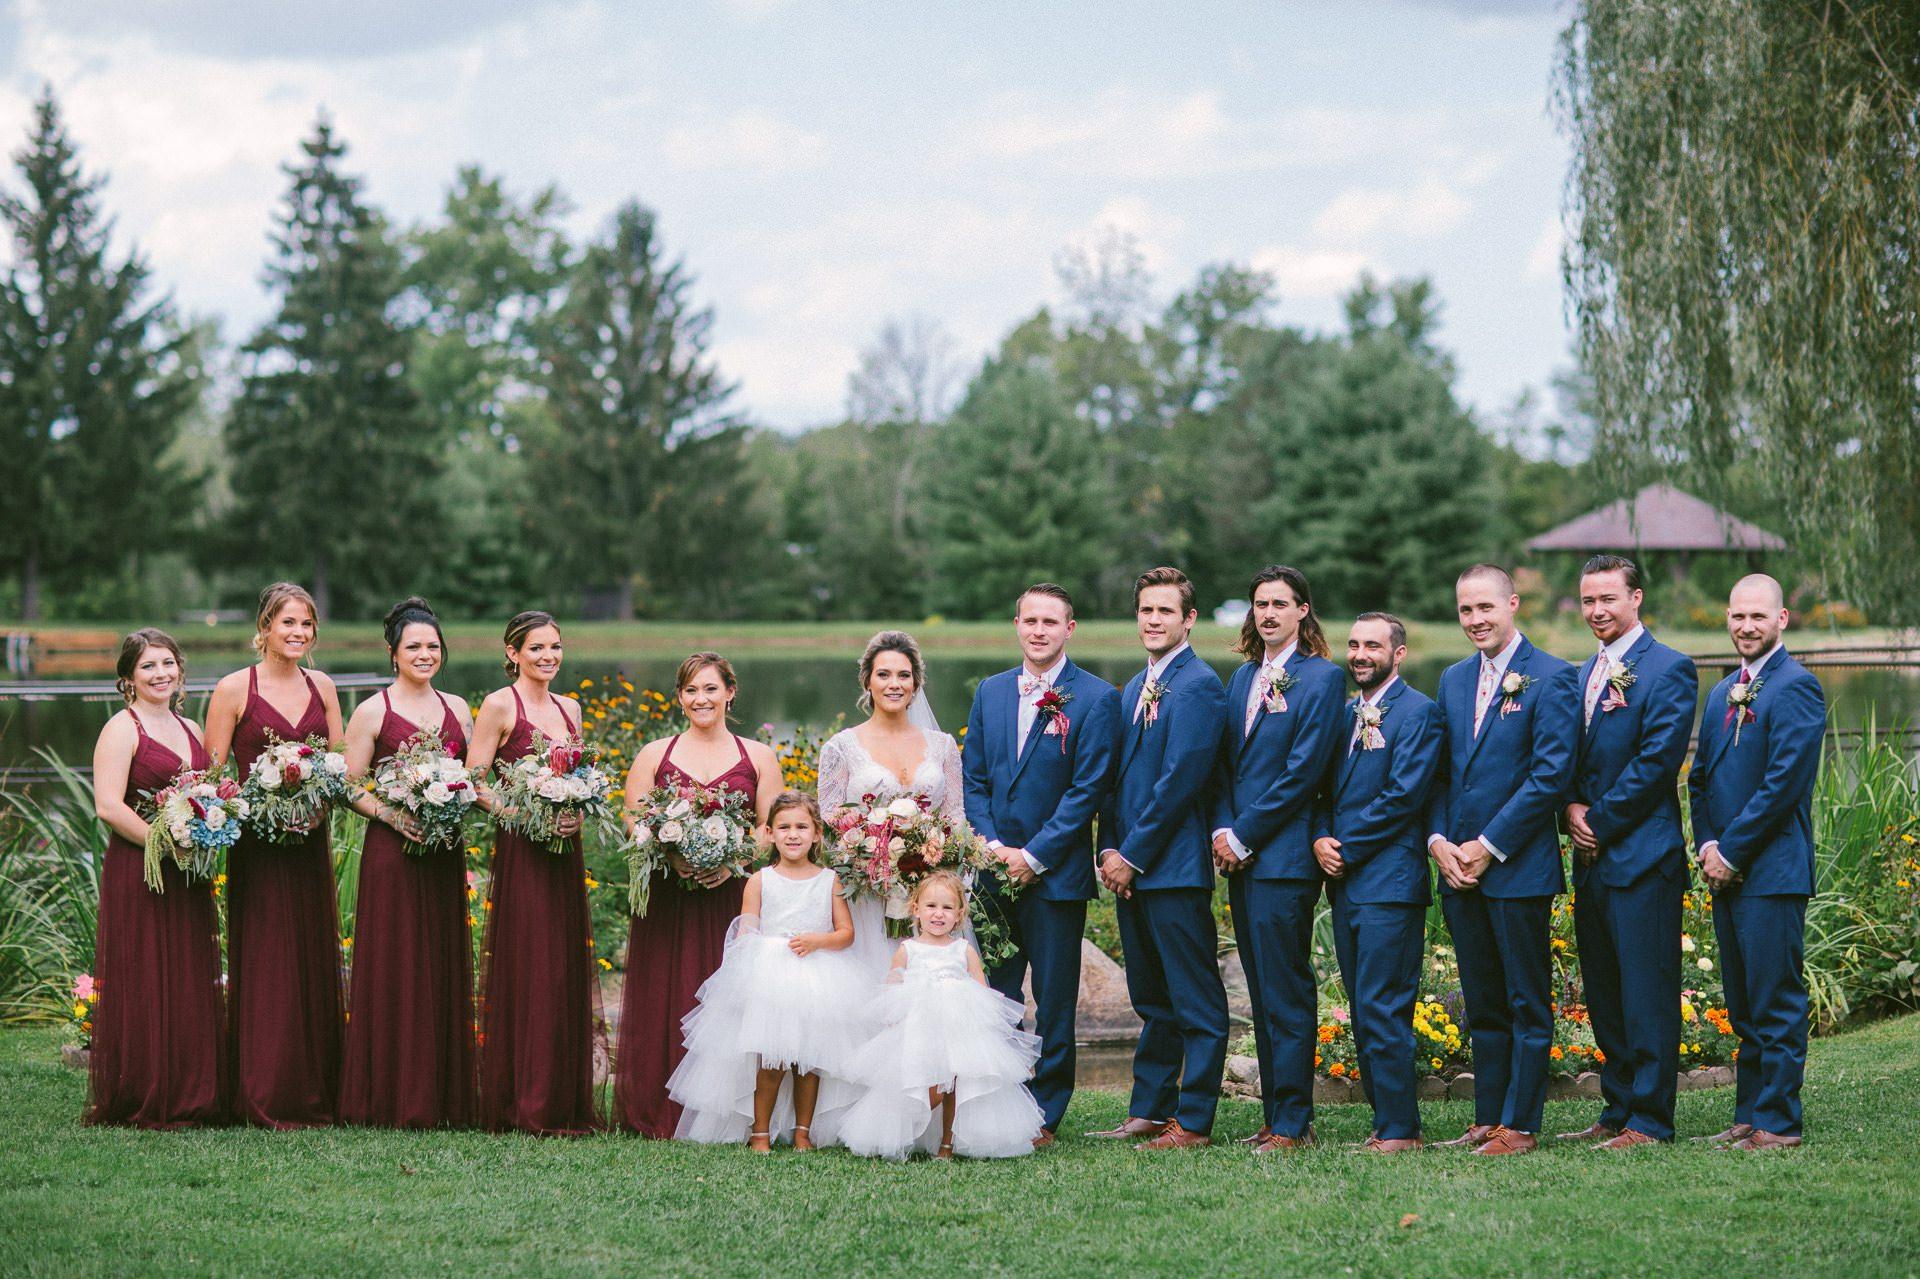 Meadow Ridge Farm Wedding Photos in Windsor 1 38.jpg